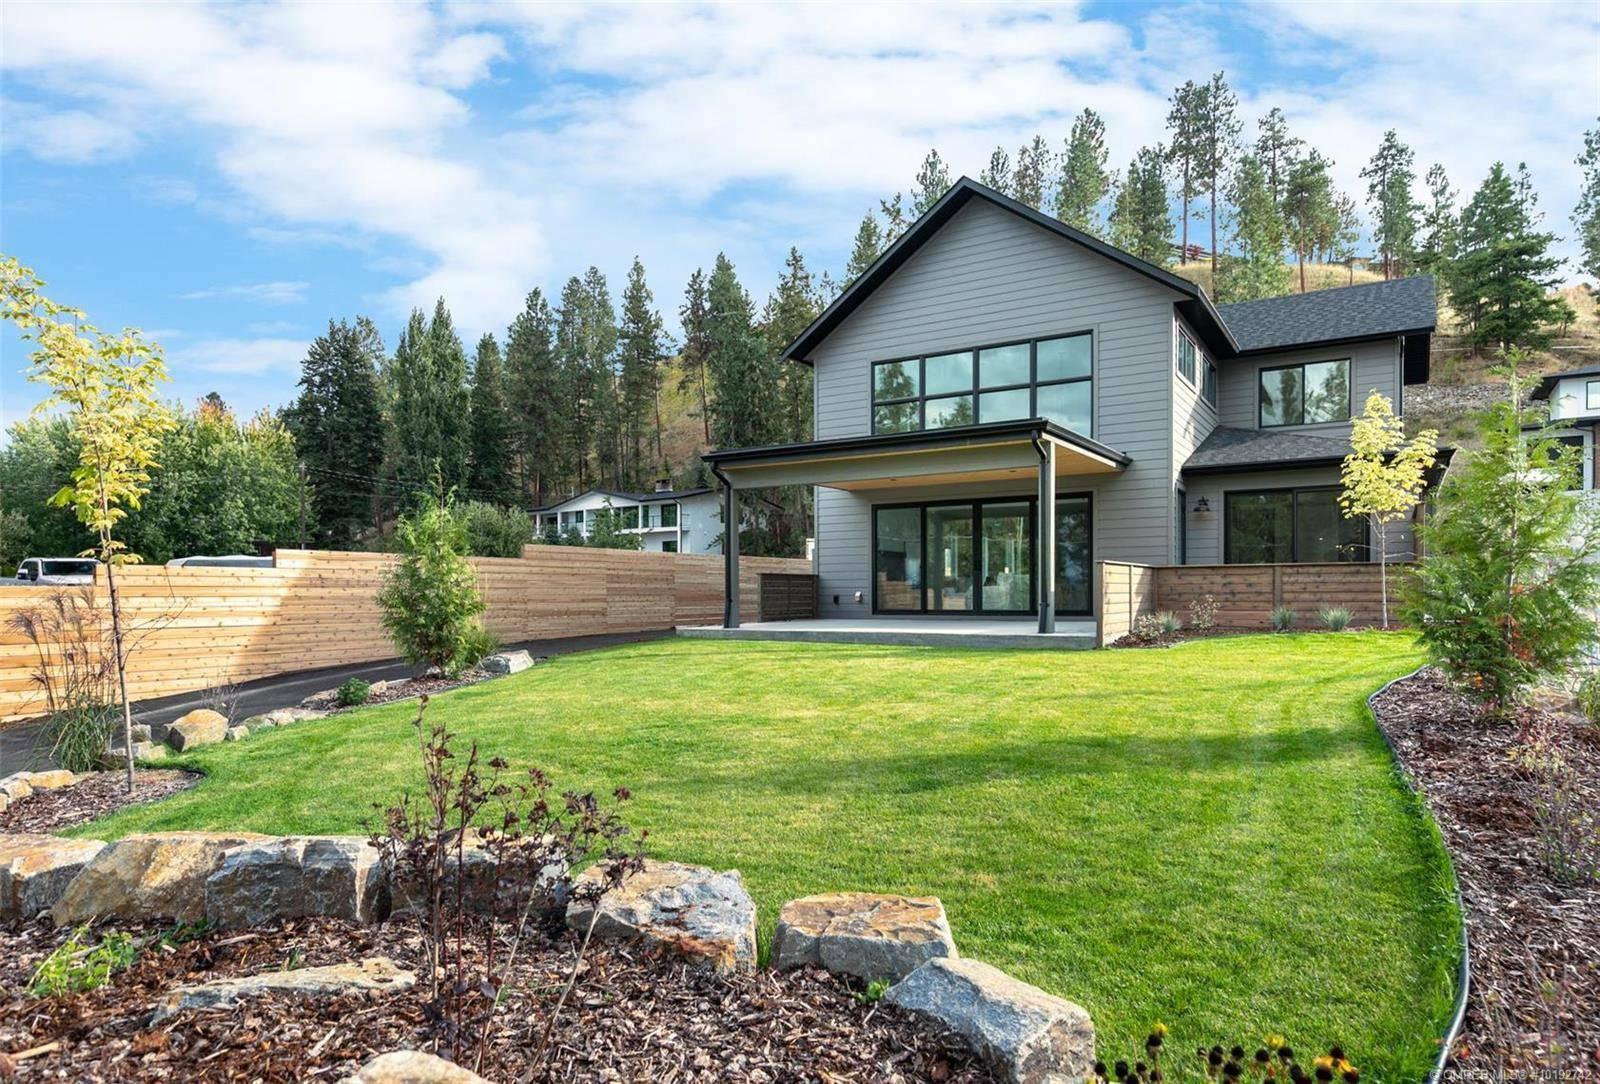 House for sale at 773 Barnaby Rd Kelowna British Columbia - MLS: 10192742